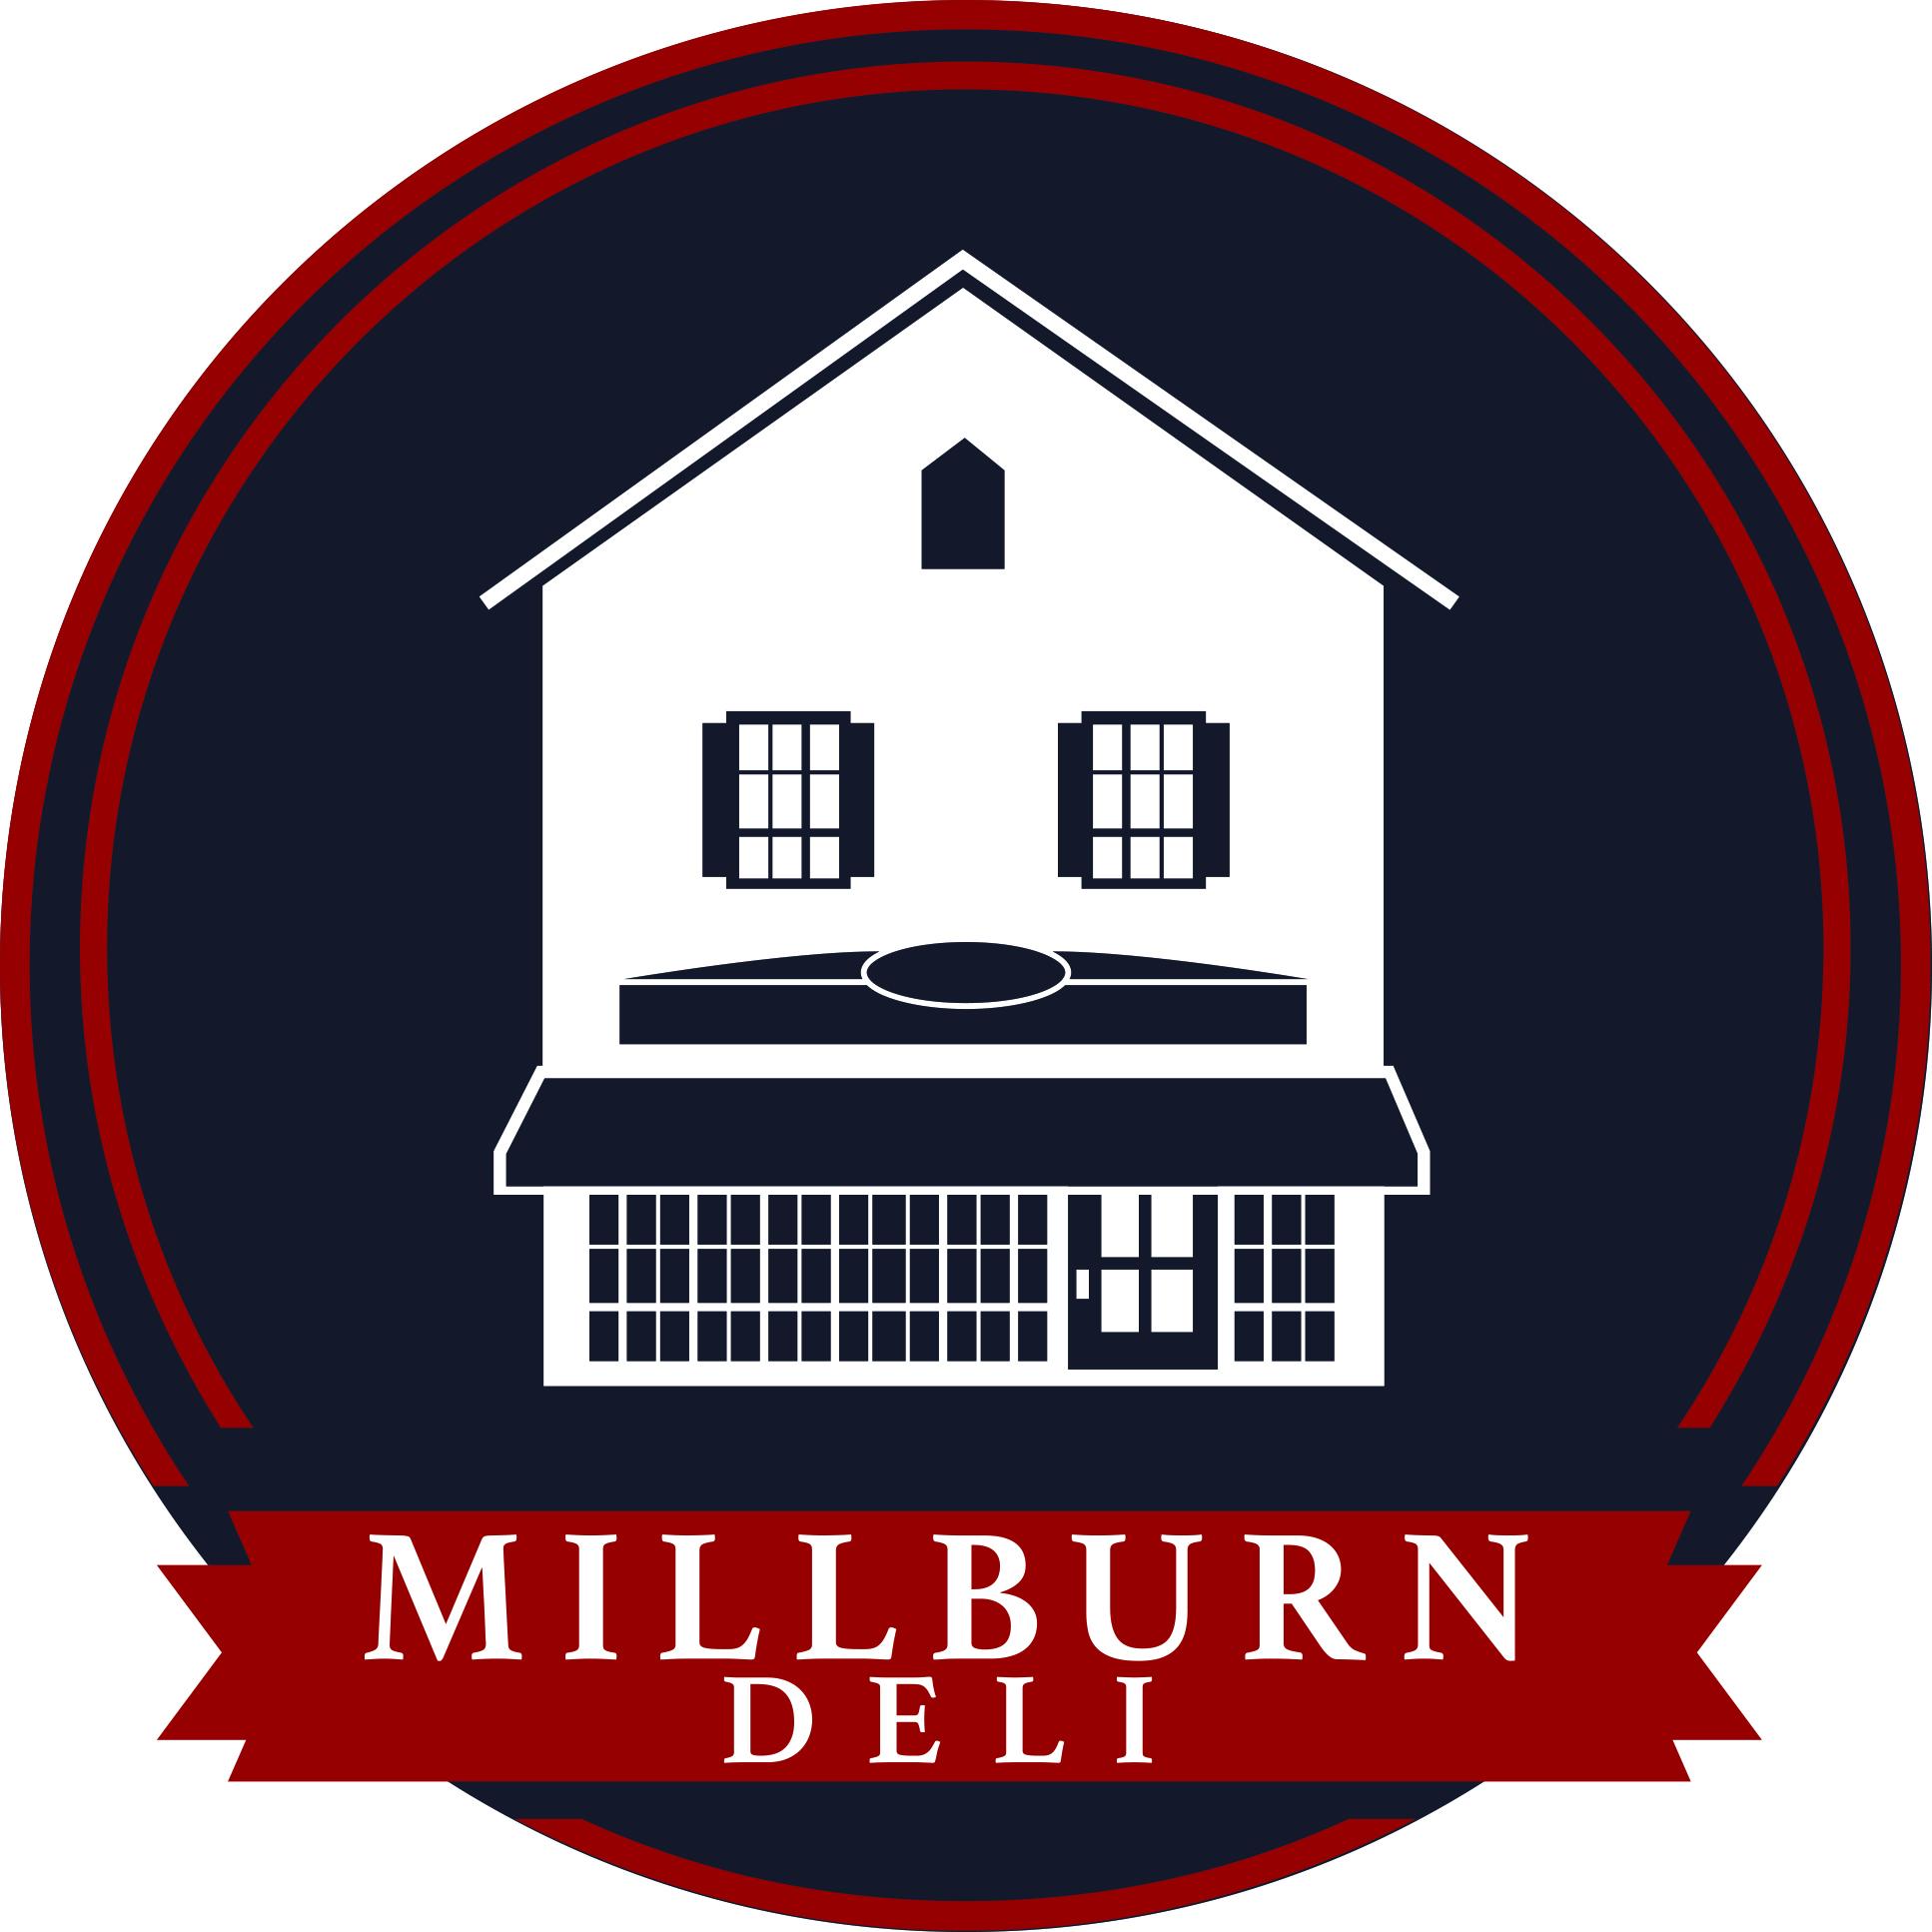 Millburnn Deli